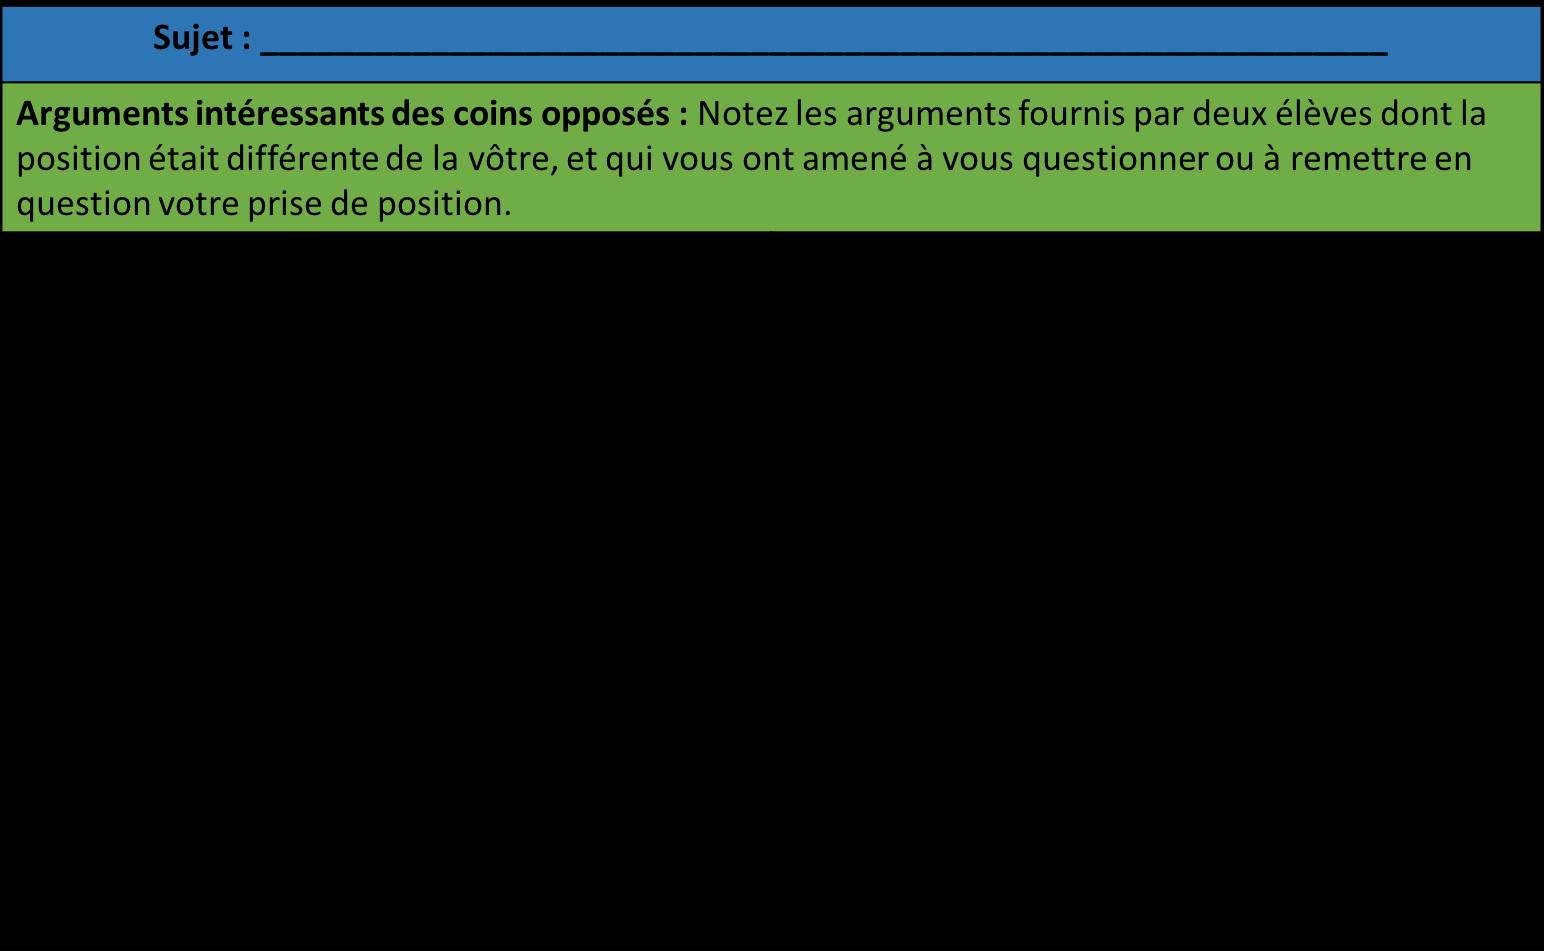 quatre_coins_arguments_opposes